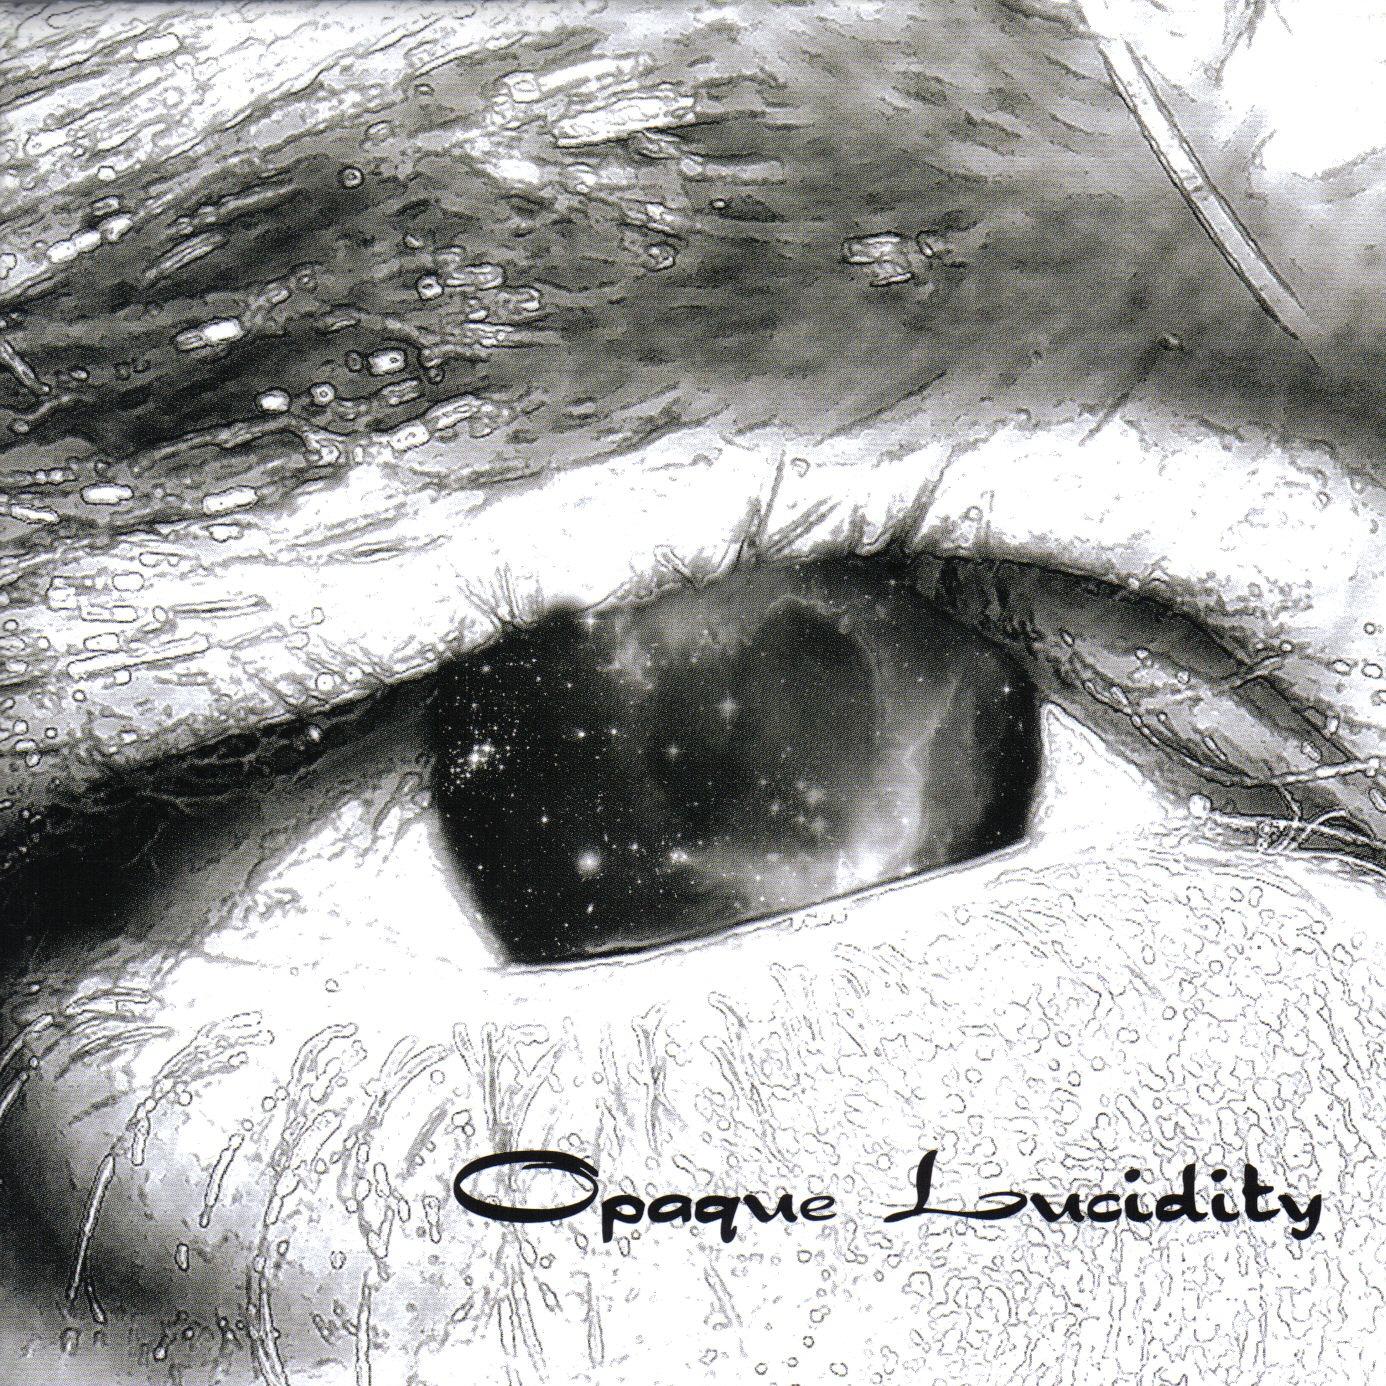 OPAQUE LUCIDITY Opaque